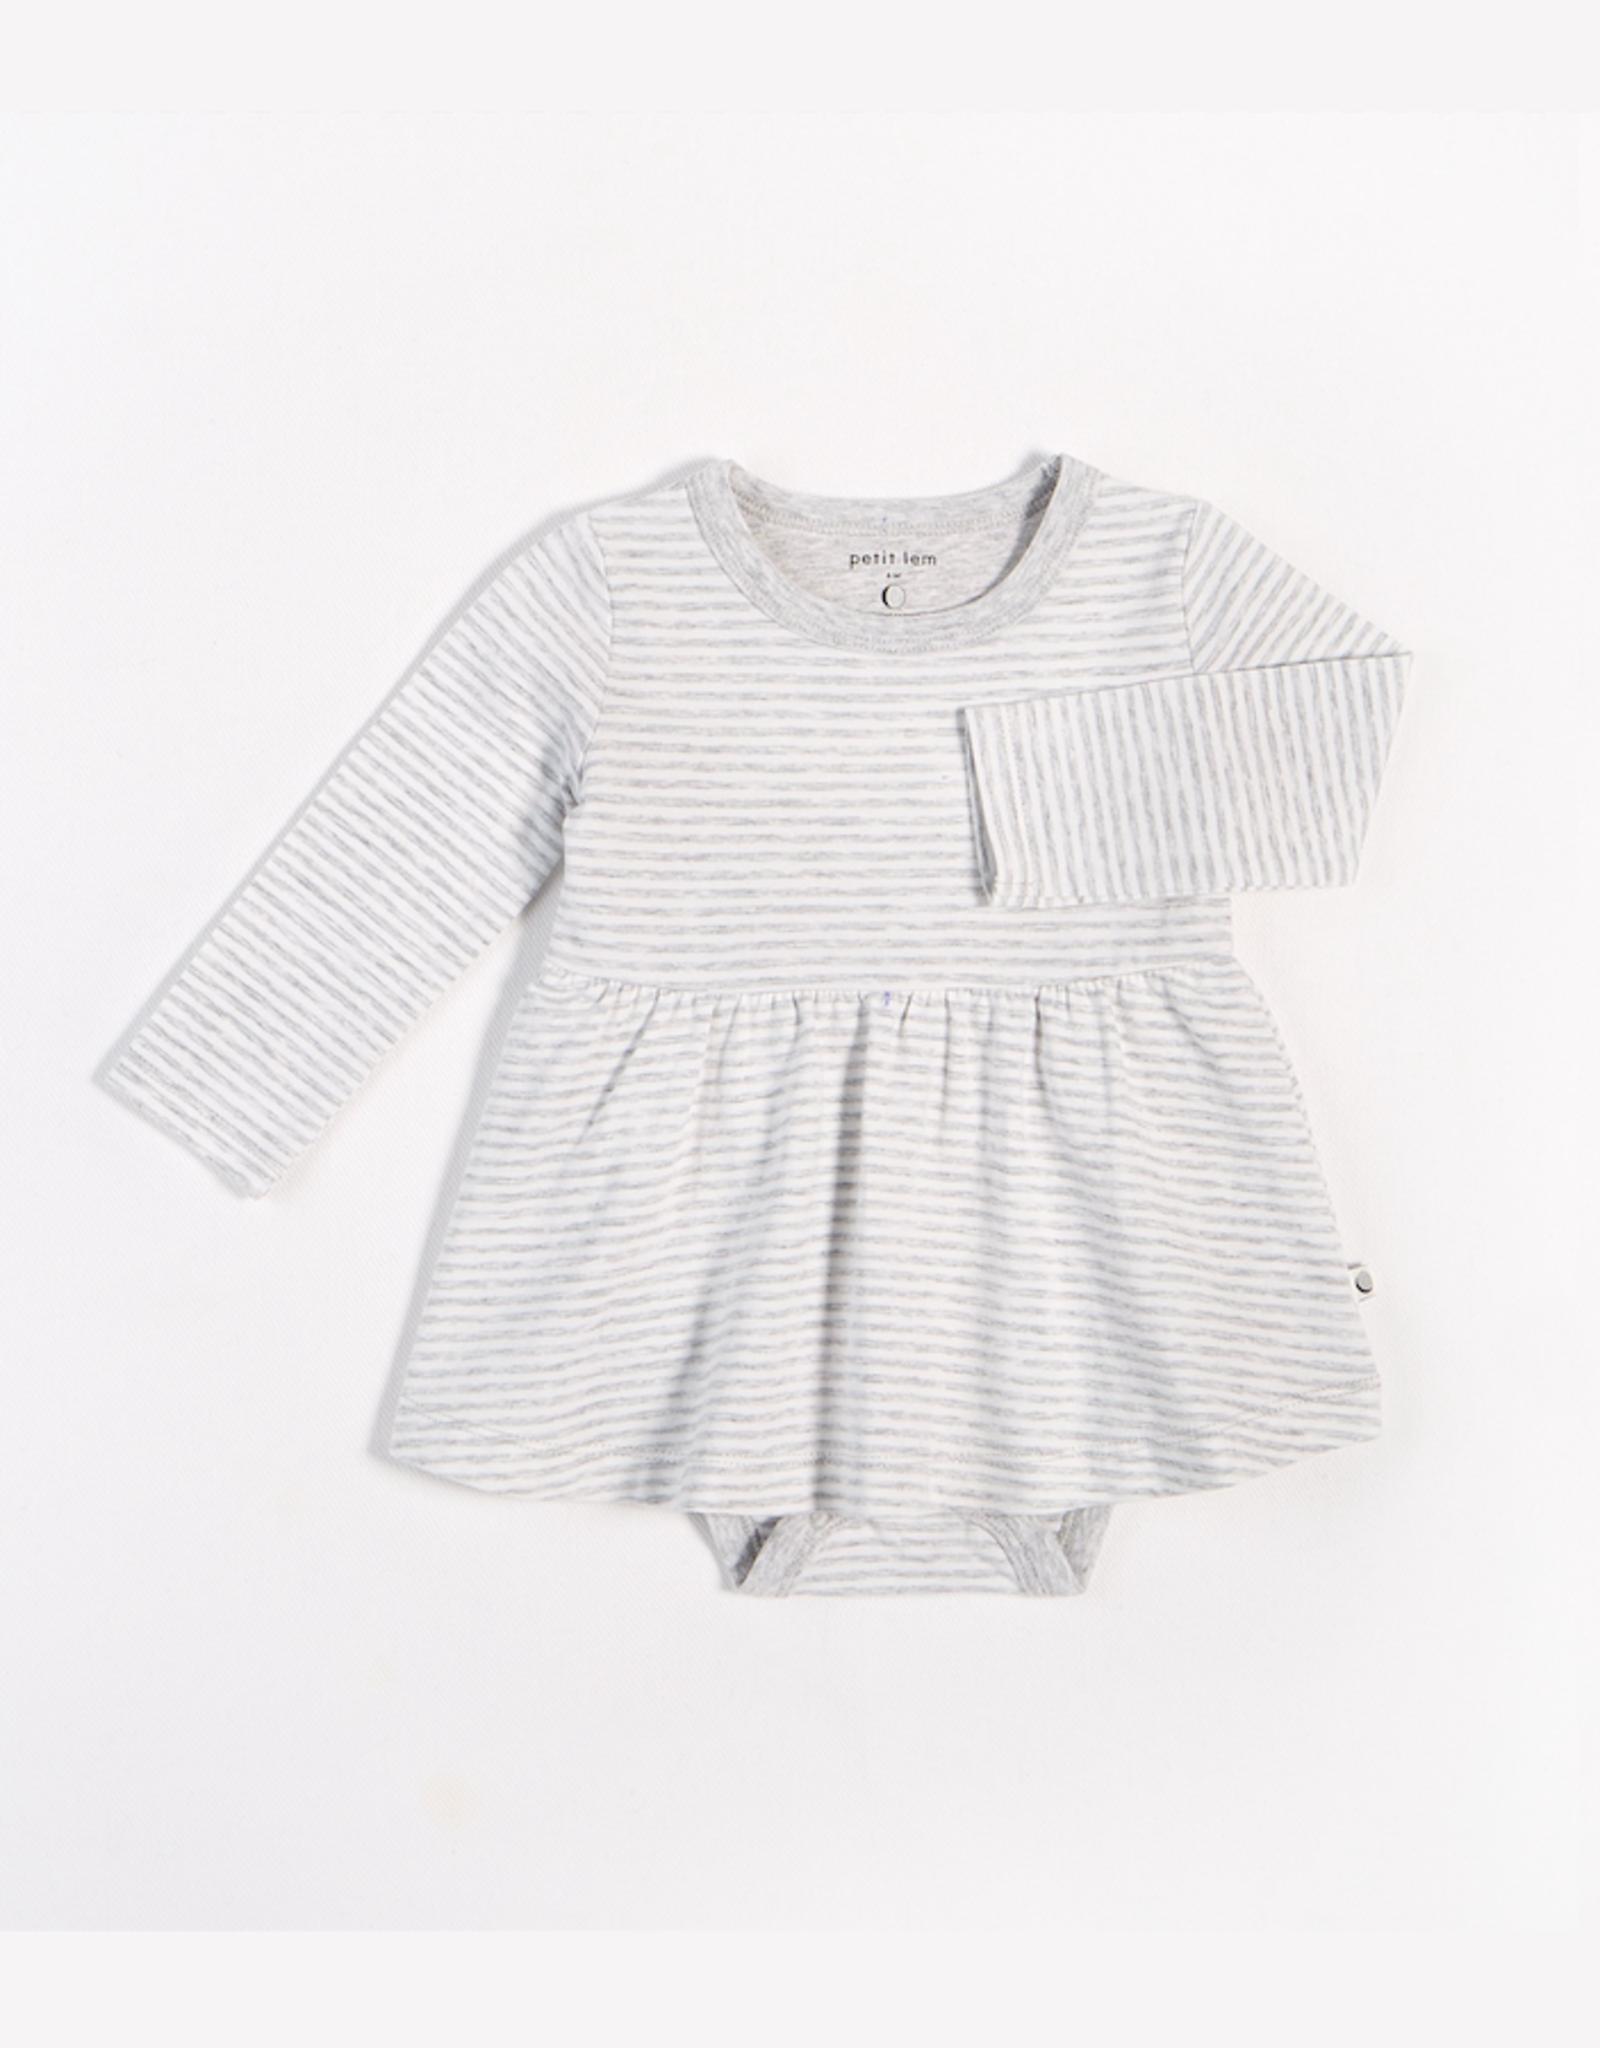 Grey Striped Long-Sleeve Peplum Onesie with Organic Cotton